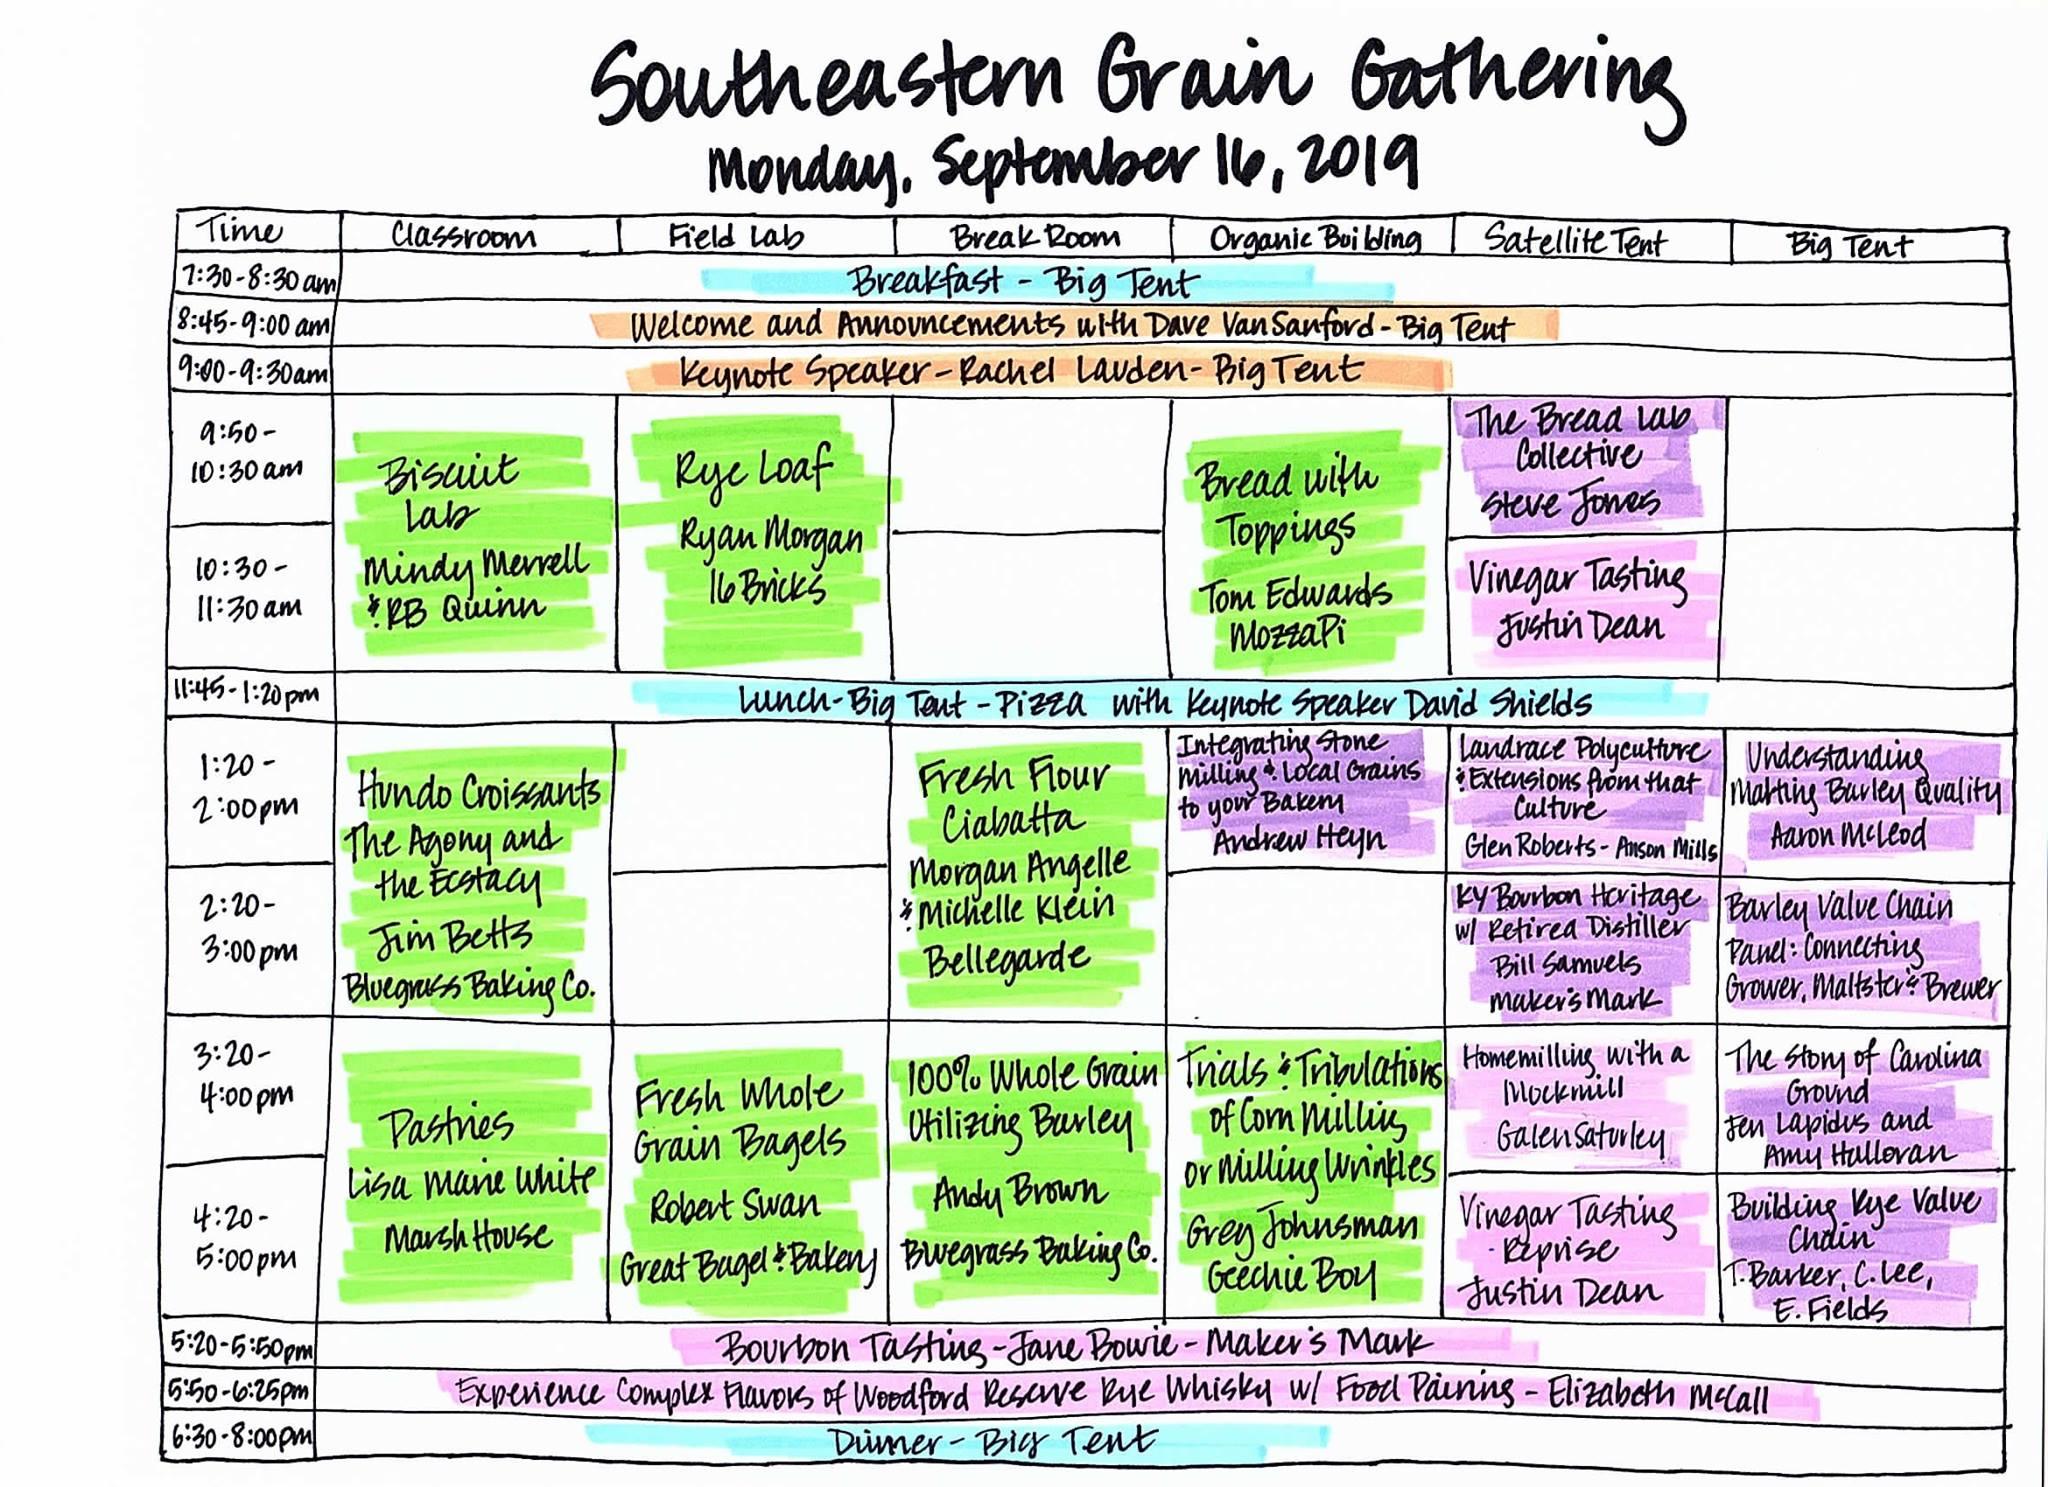 southeastern grain gathering schedule day 2 _o.jpg